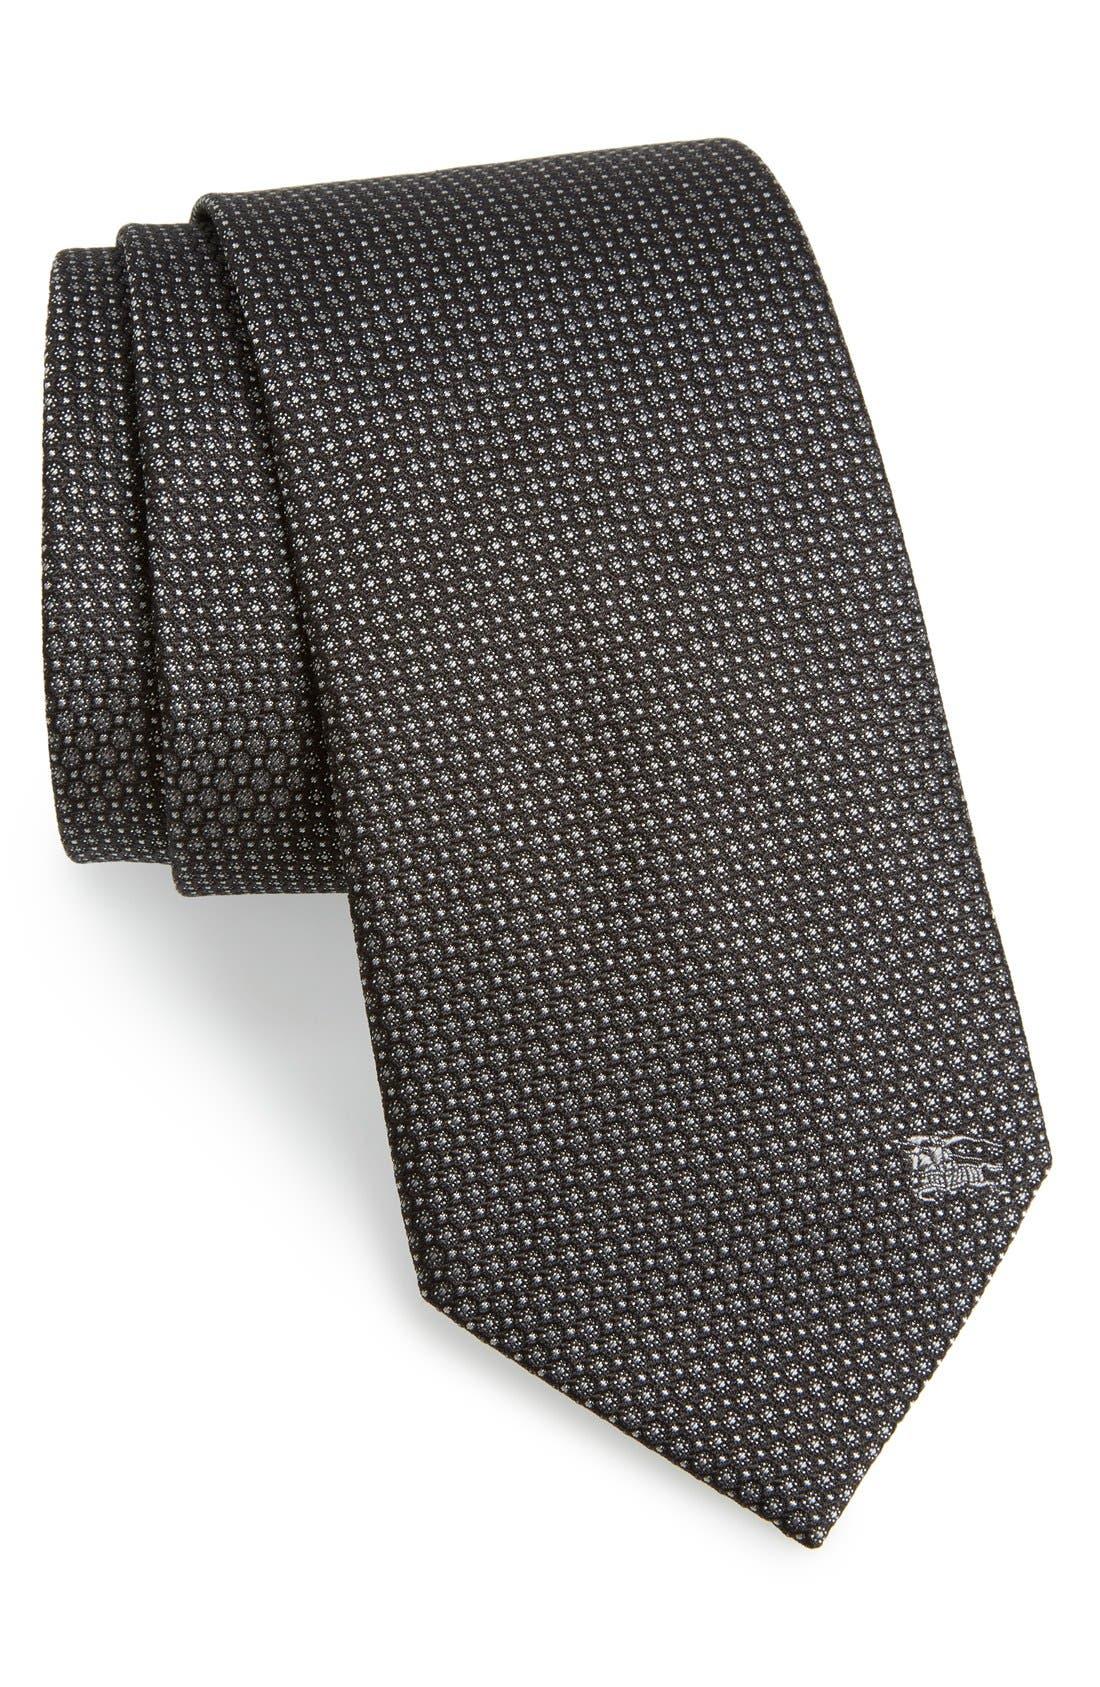 London 'Clinton' Medallion Silk Tie,                         Main,                         color, Black